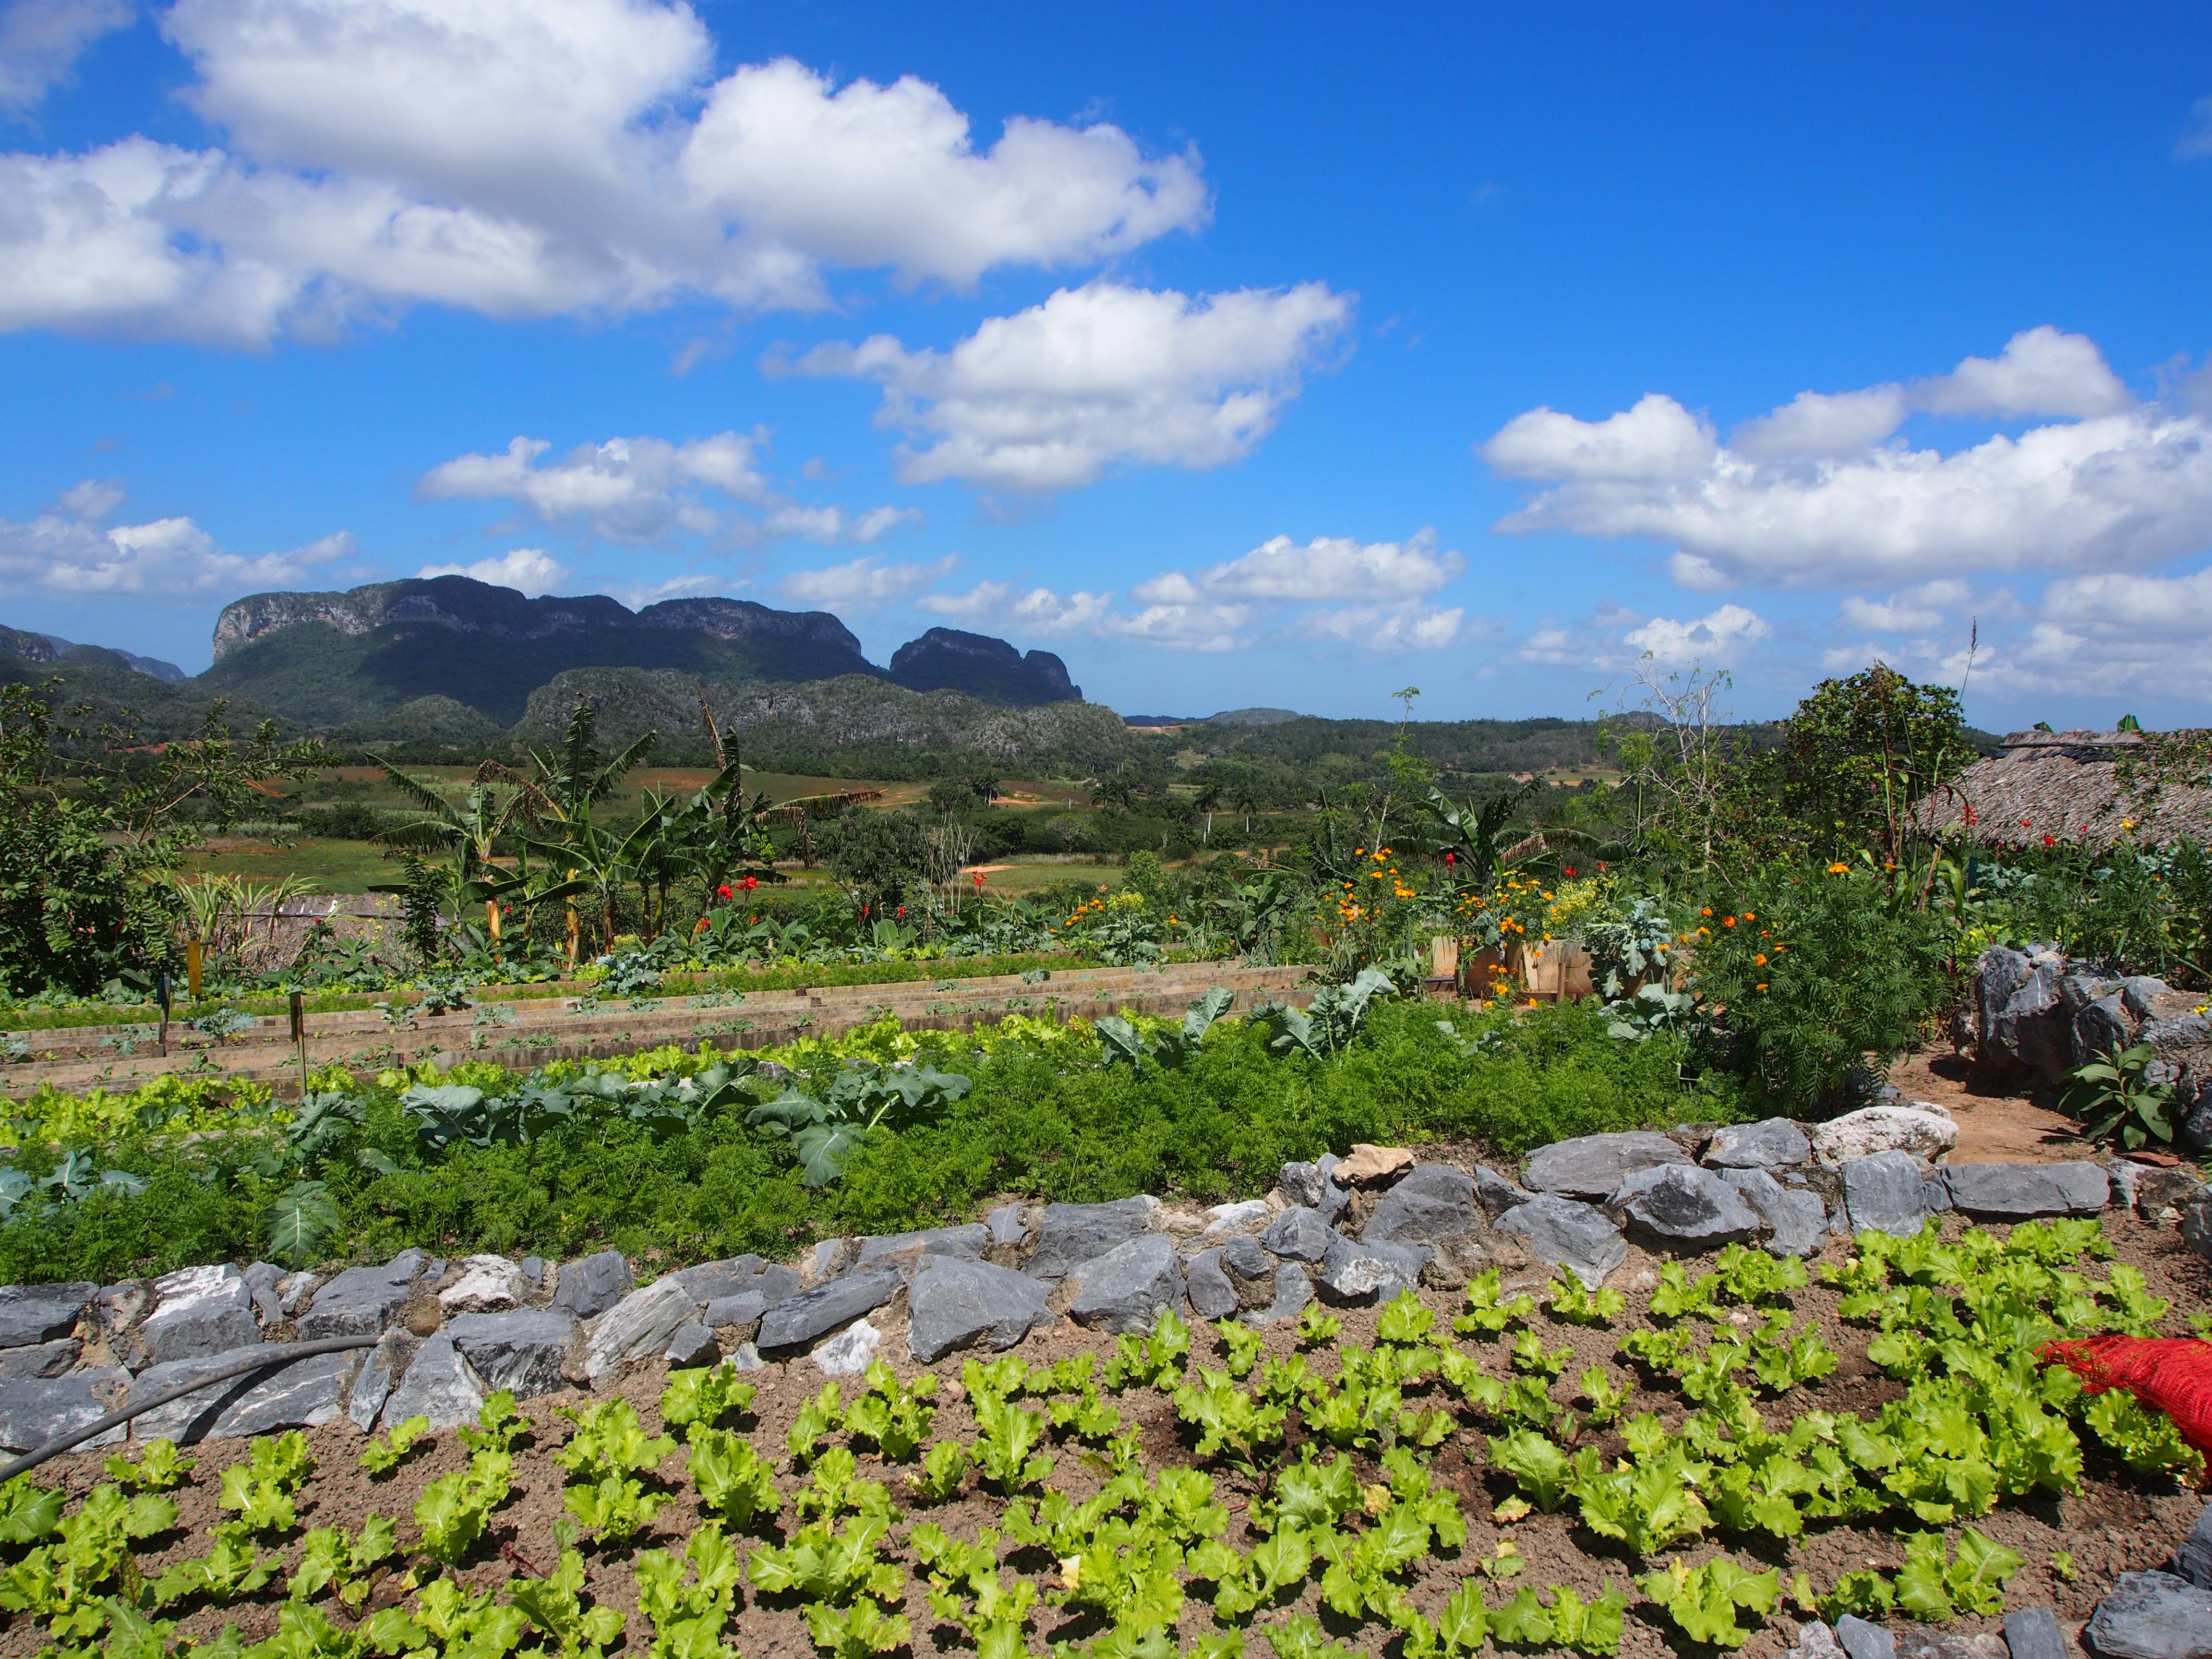 Kuba Landwirtschaft